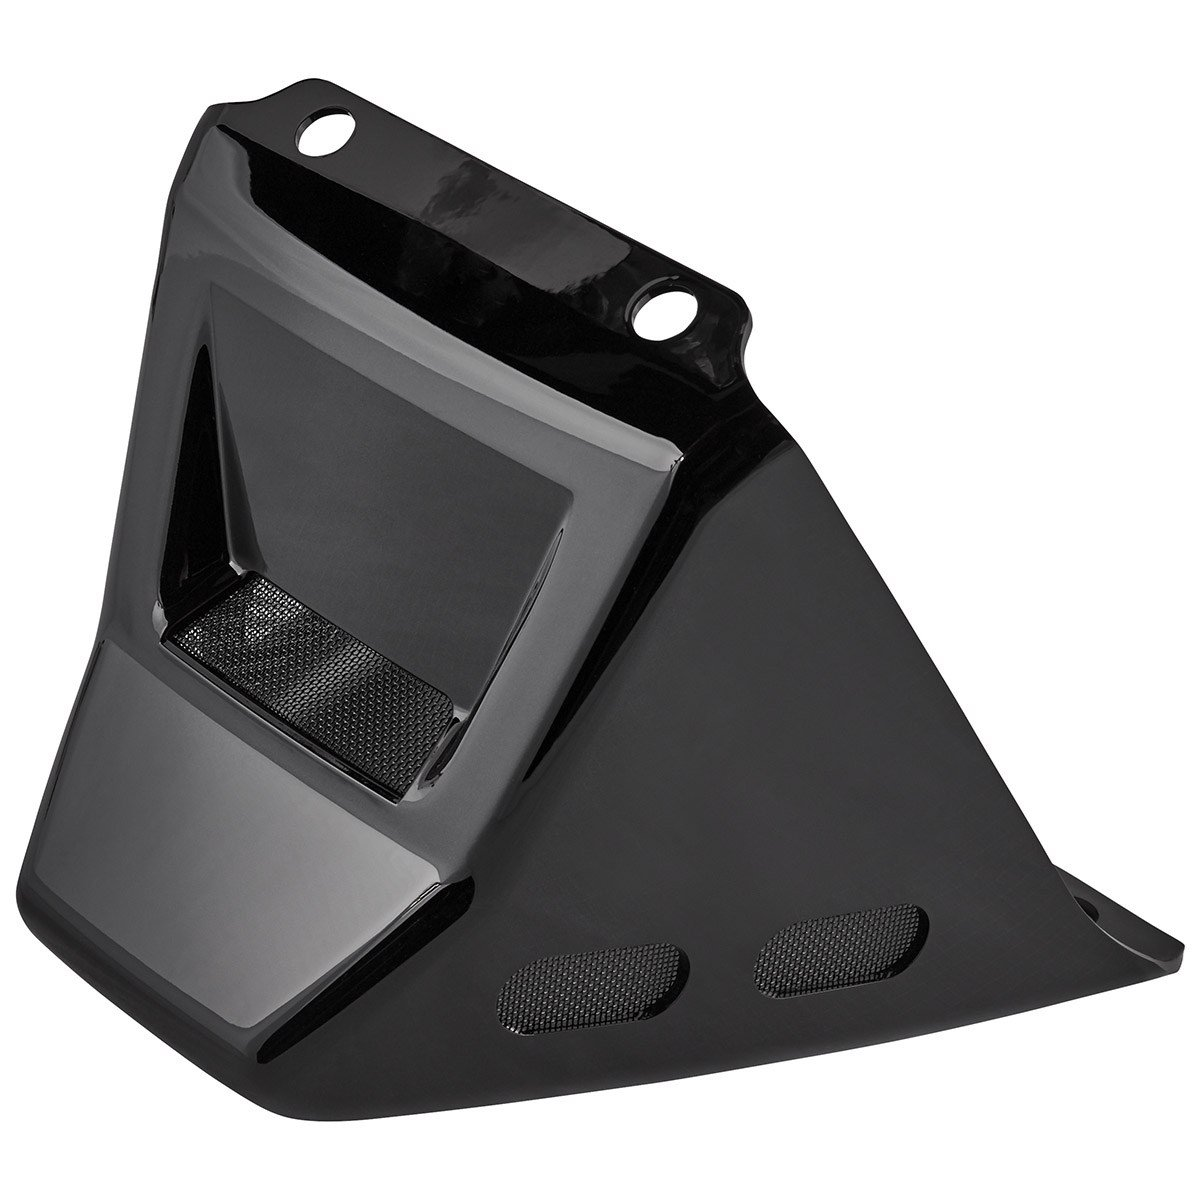 14-18 YAMAHA Bolt: Genuine Yamaha Accessories Lower Chin Fairing (Raven)